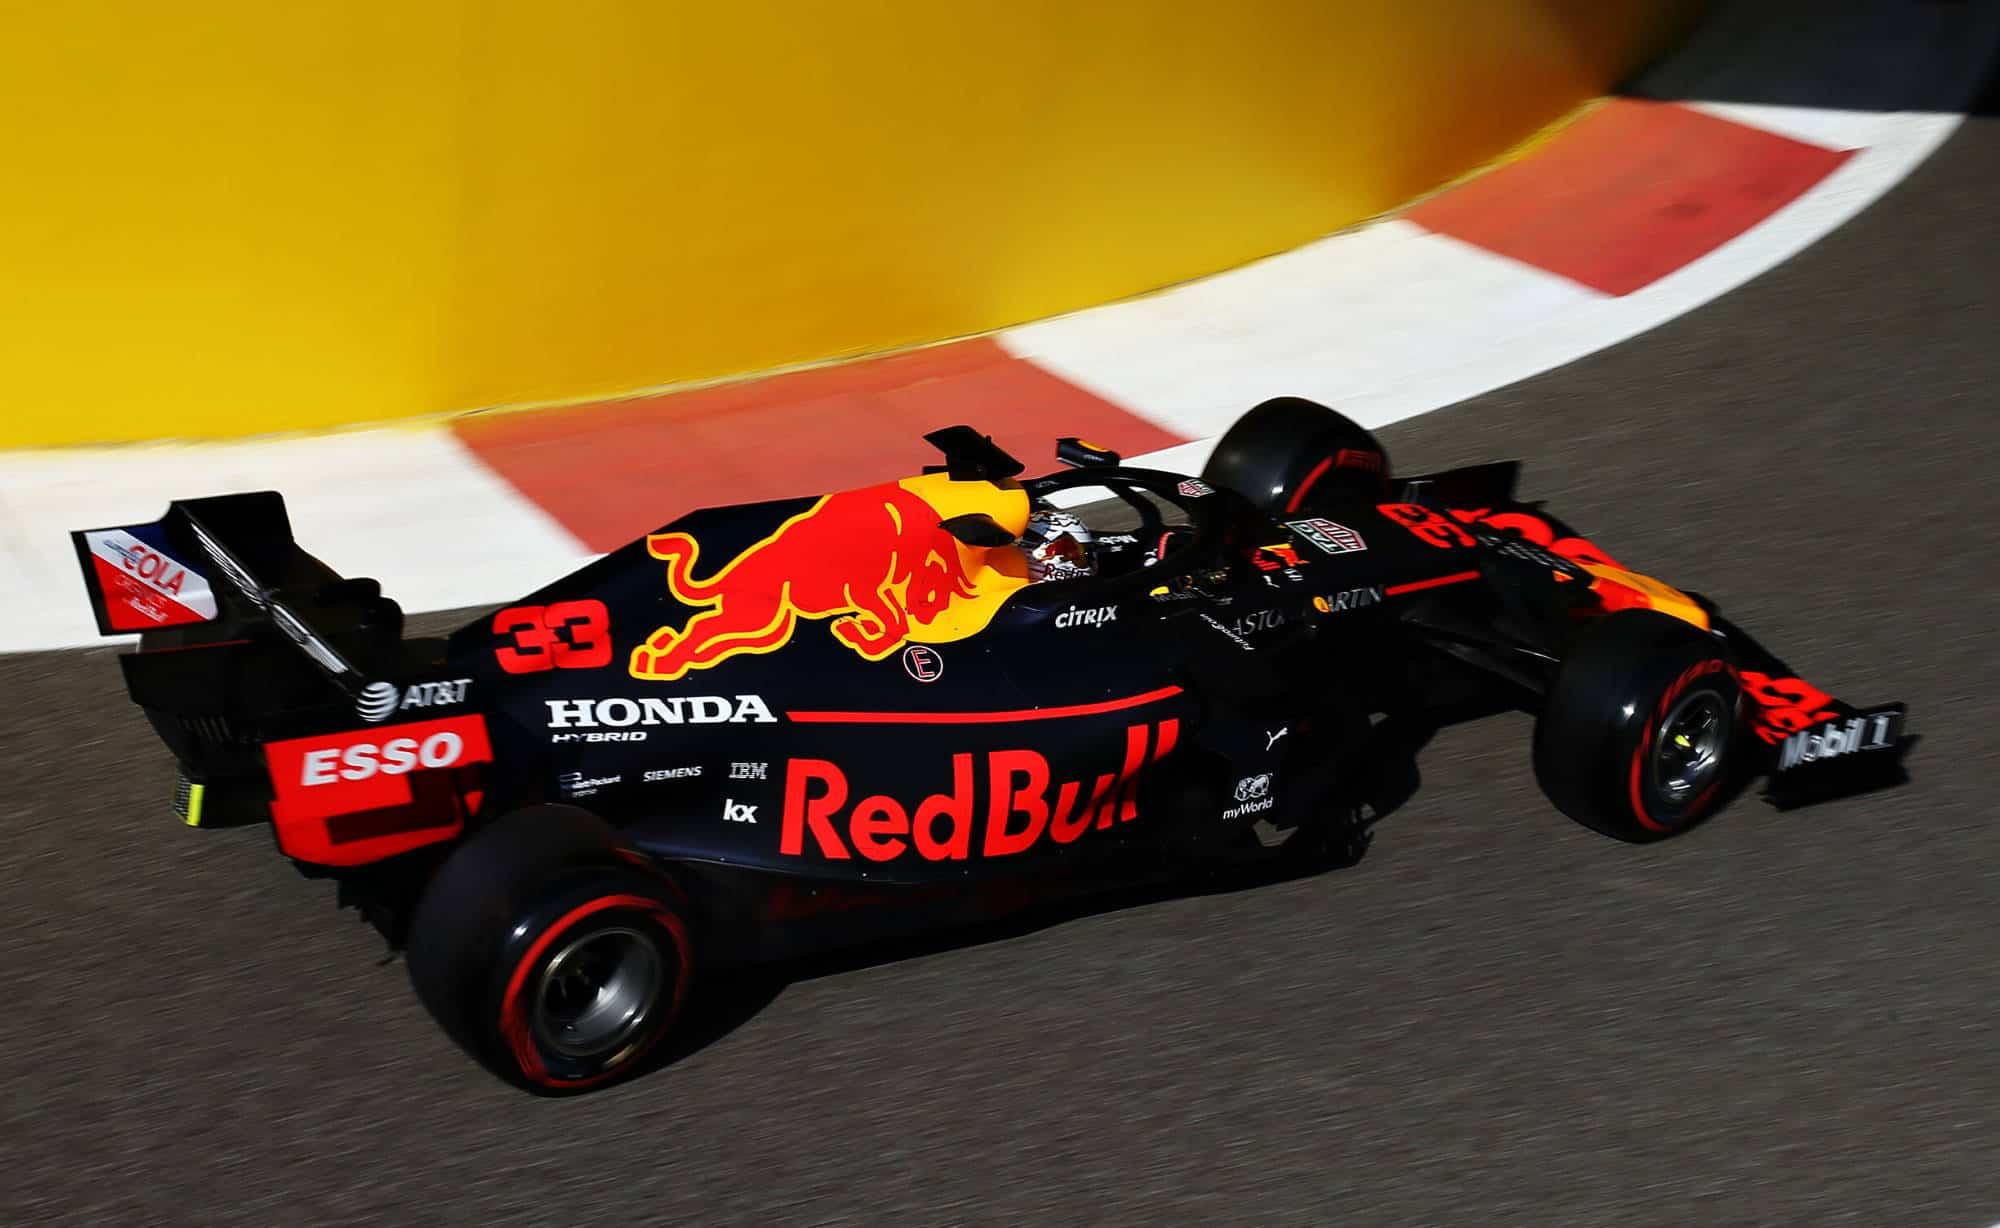 Verstappen Red Bull Abu Dhabi GP F1 2019 pitlane exit Photo Red Bull